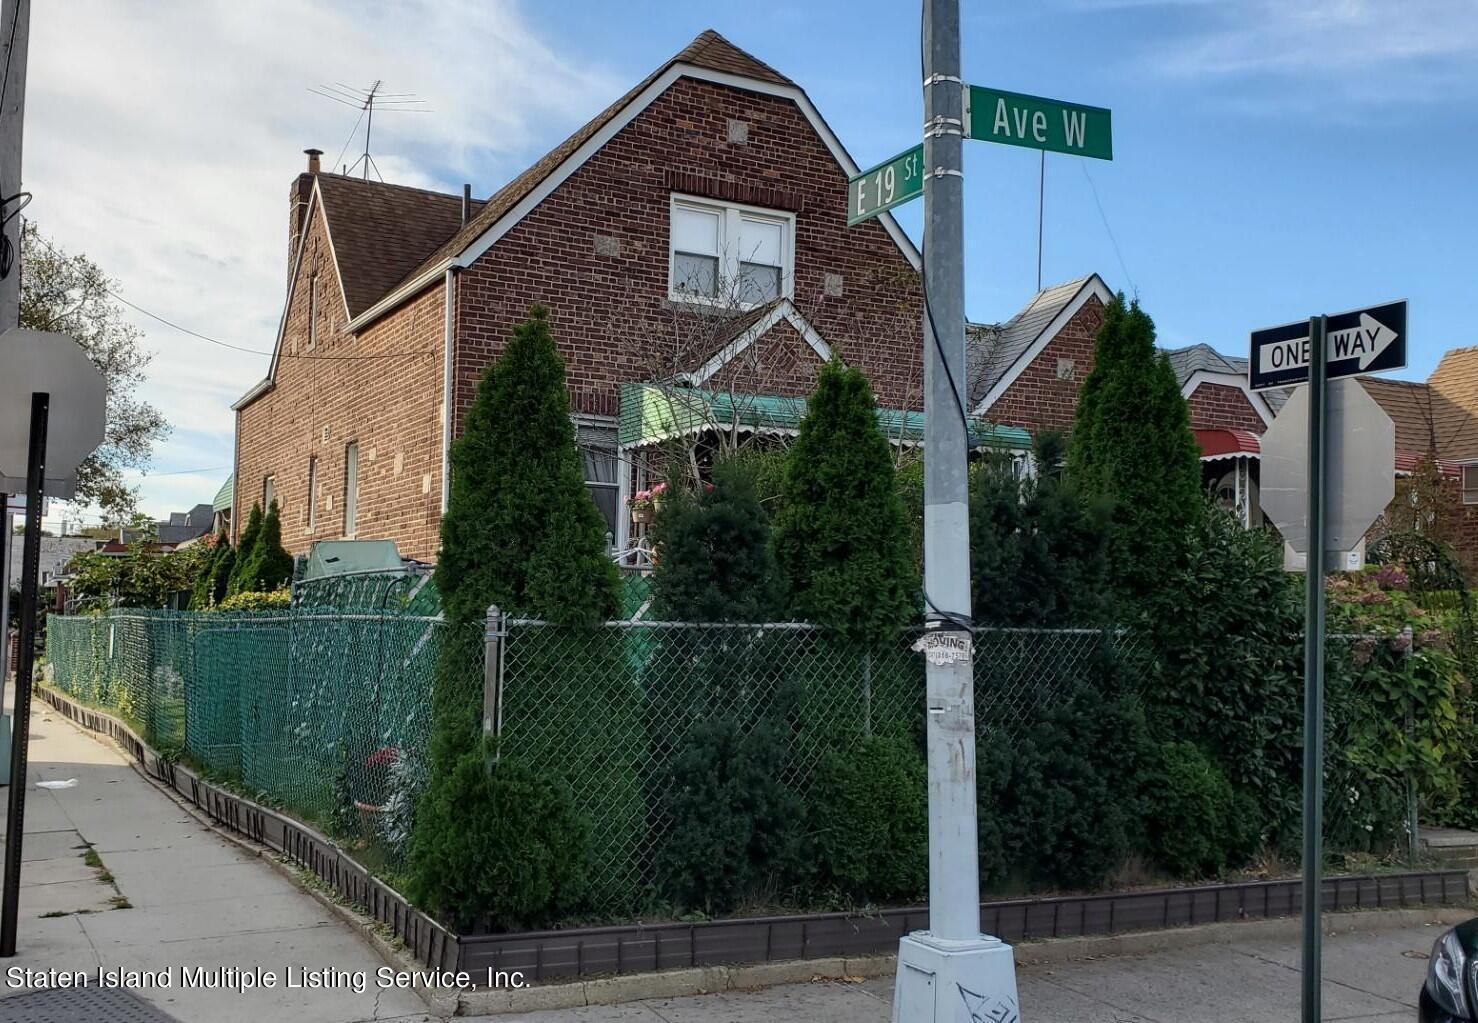 Single Family - Semi-Attached in Sheepshead Bay - 1824 Avenue W   Brooklyn, NY 11229